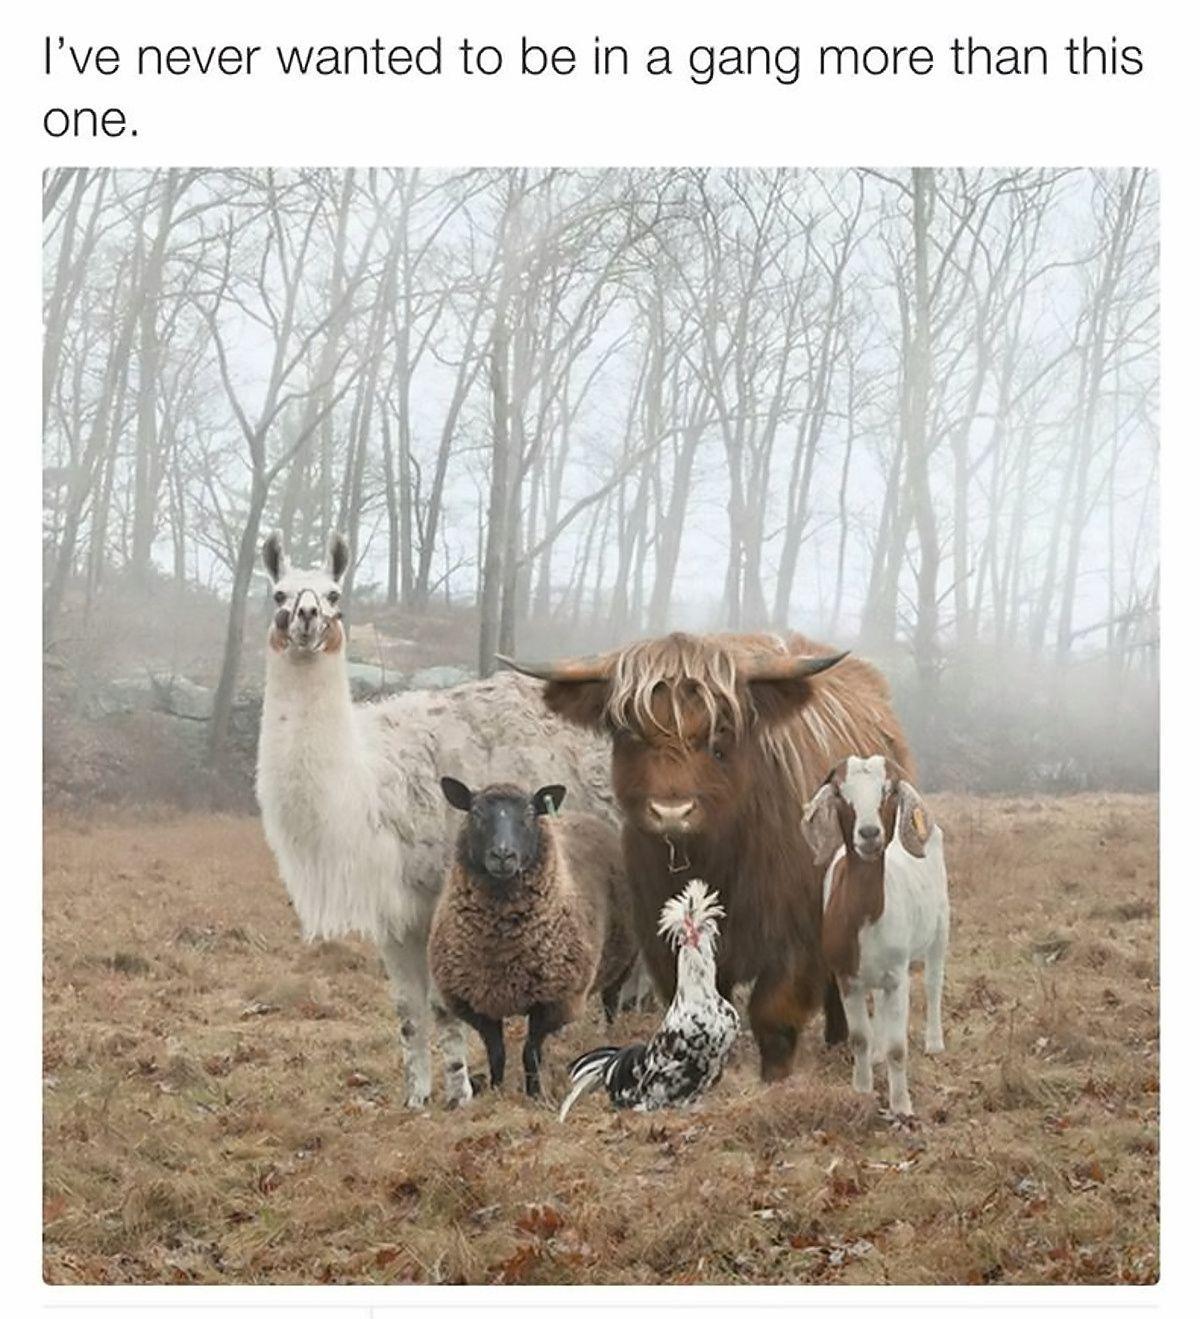 Name this gang